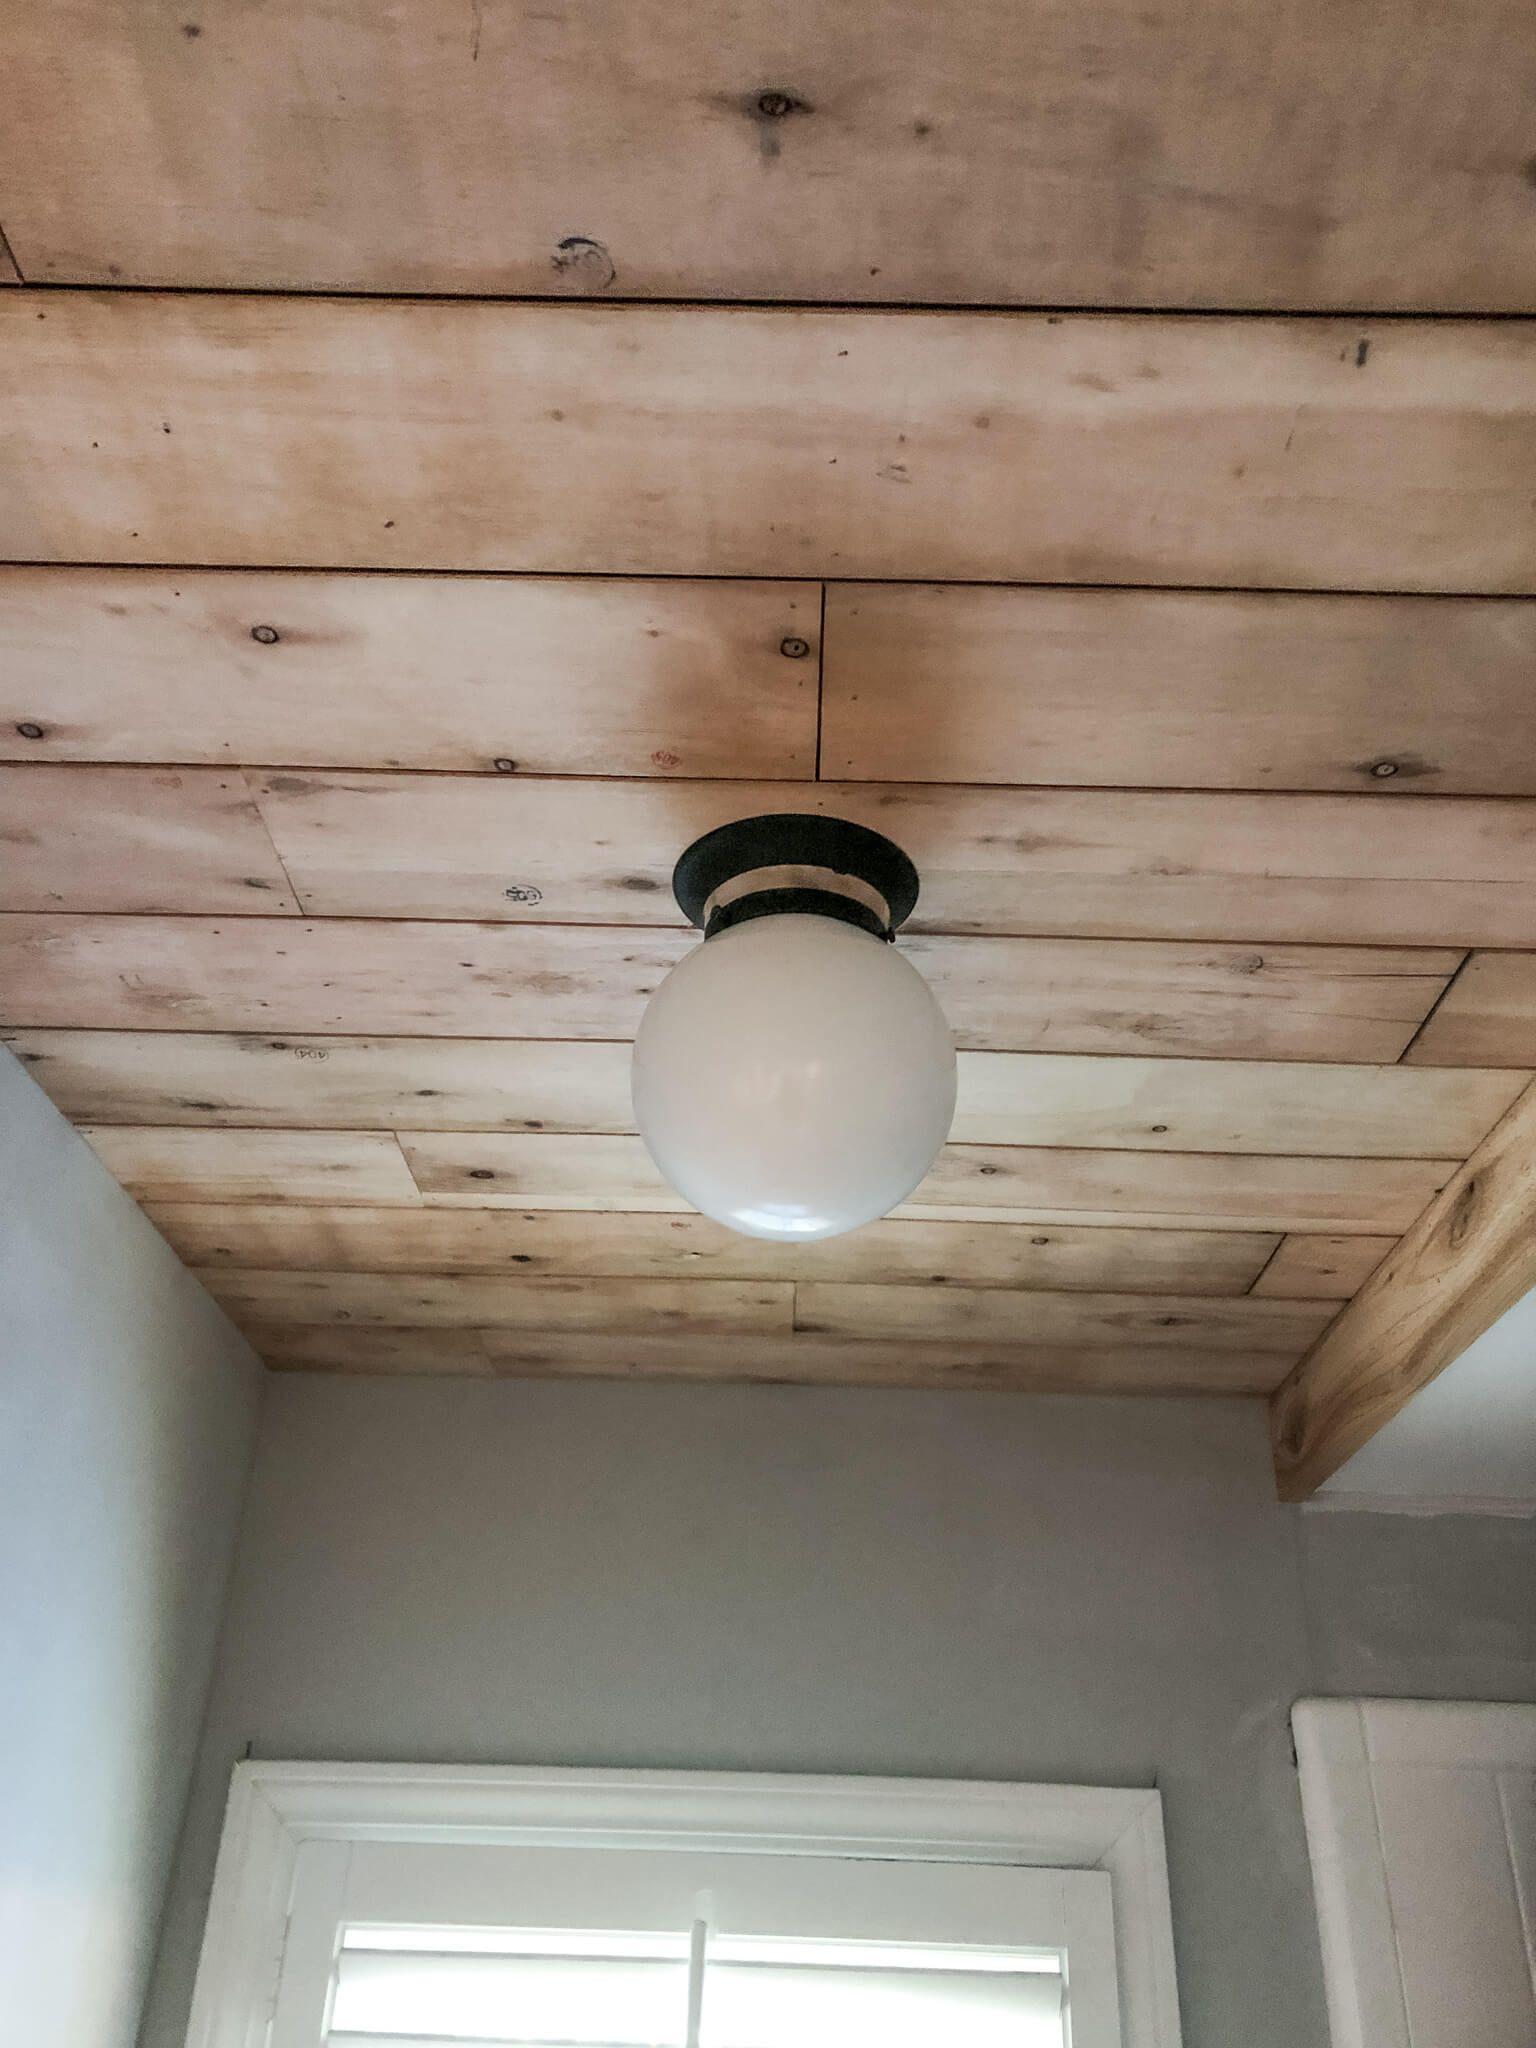 Diy Ceiling Planks From Laminate Flooring In 2020 Diy Ceiling Shower Ceilings Waterproof Laminate Flooring